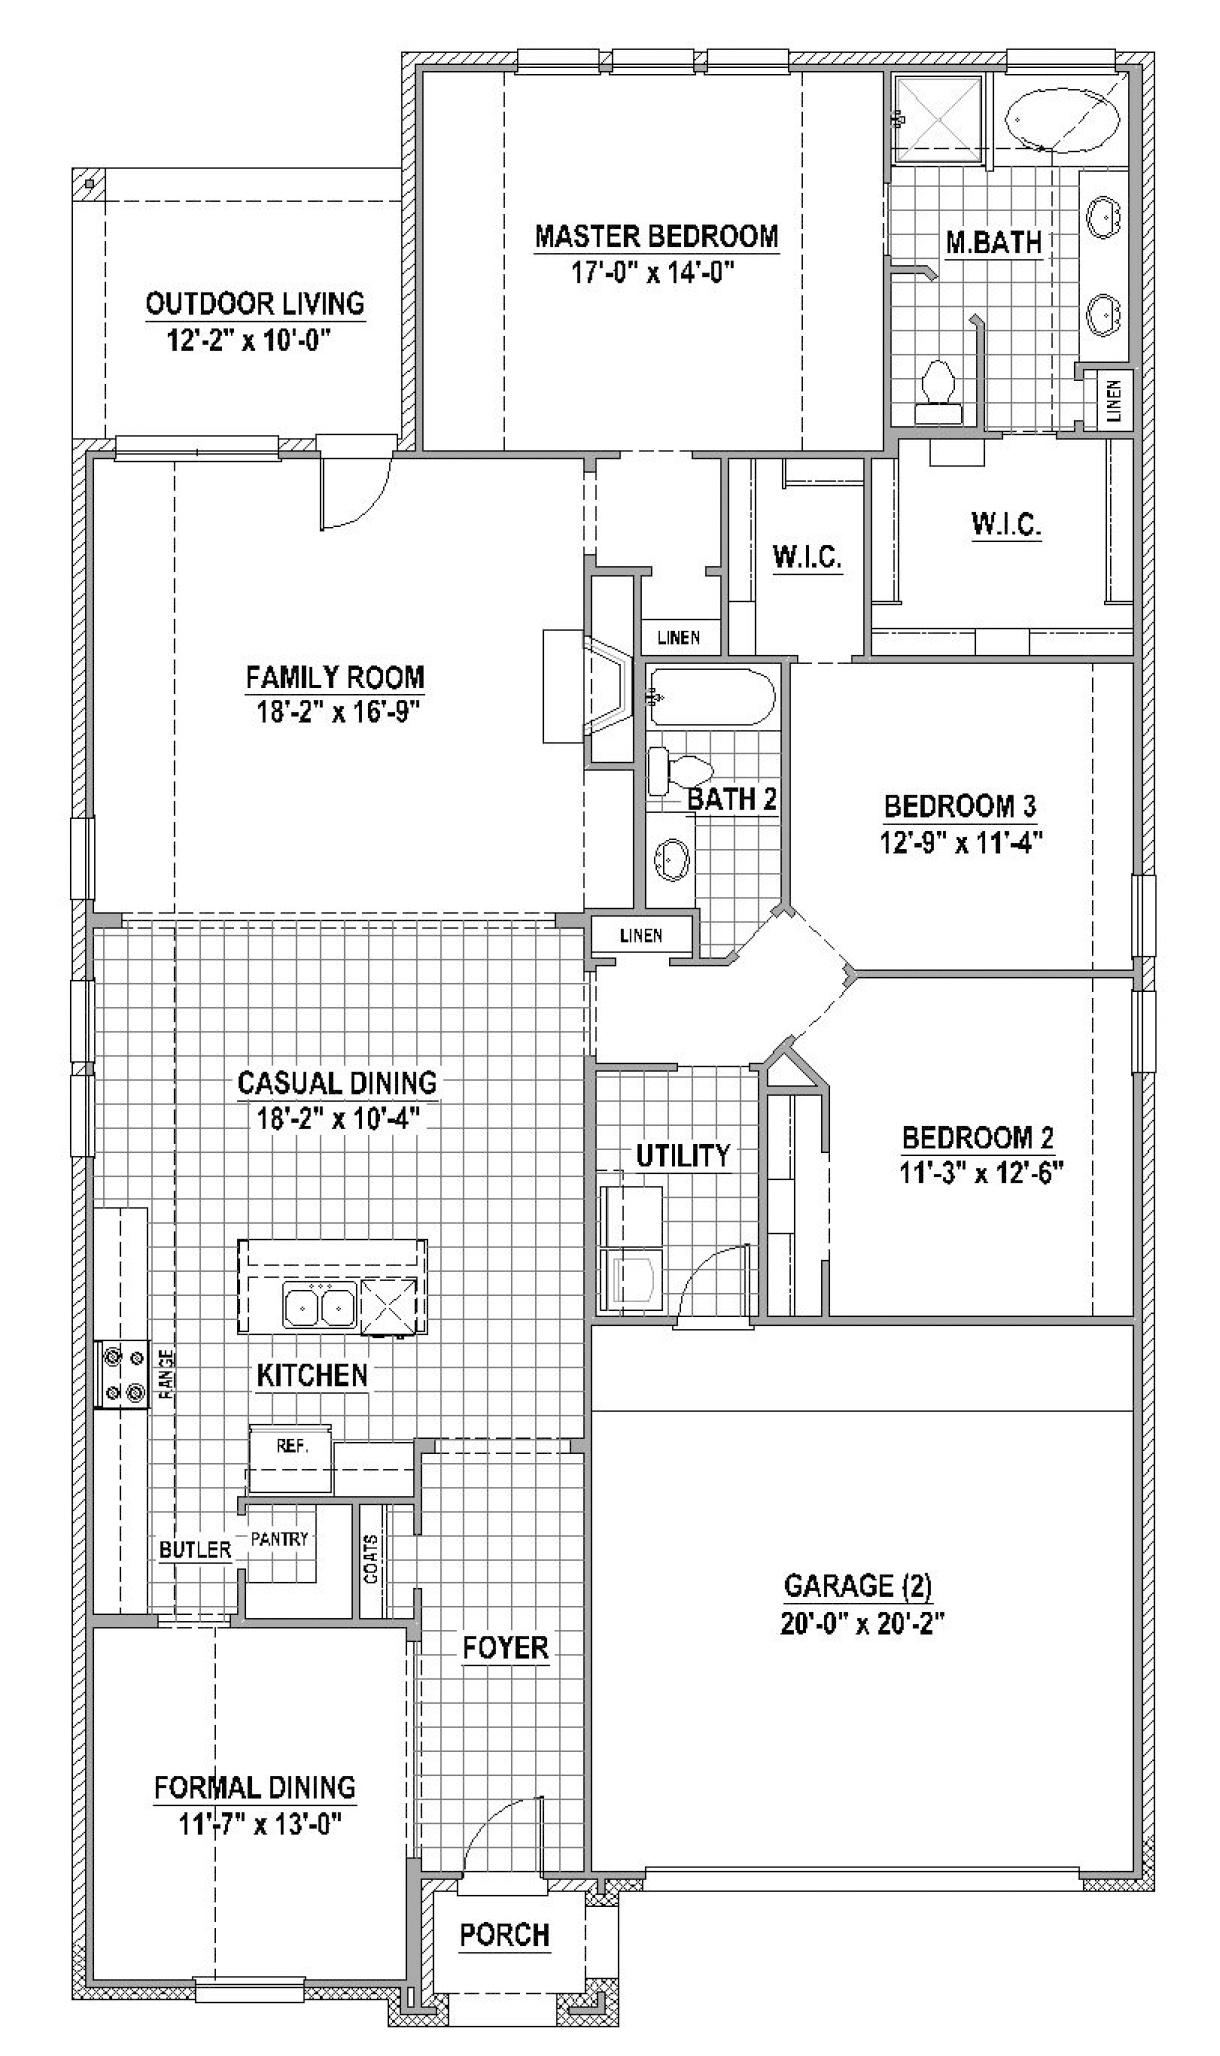 American Legend Homes - Plan 1151 - Light Farms - Celina